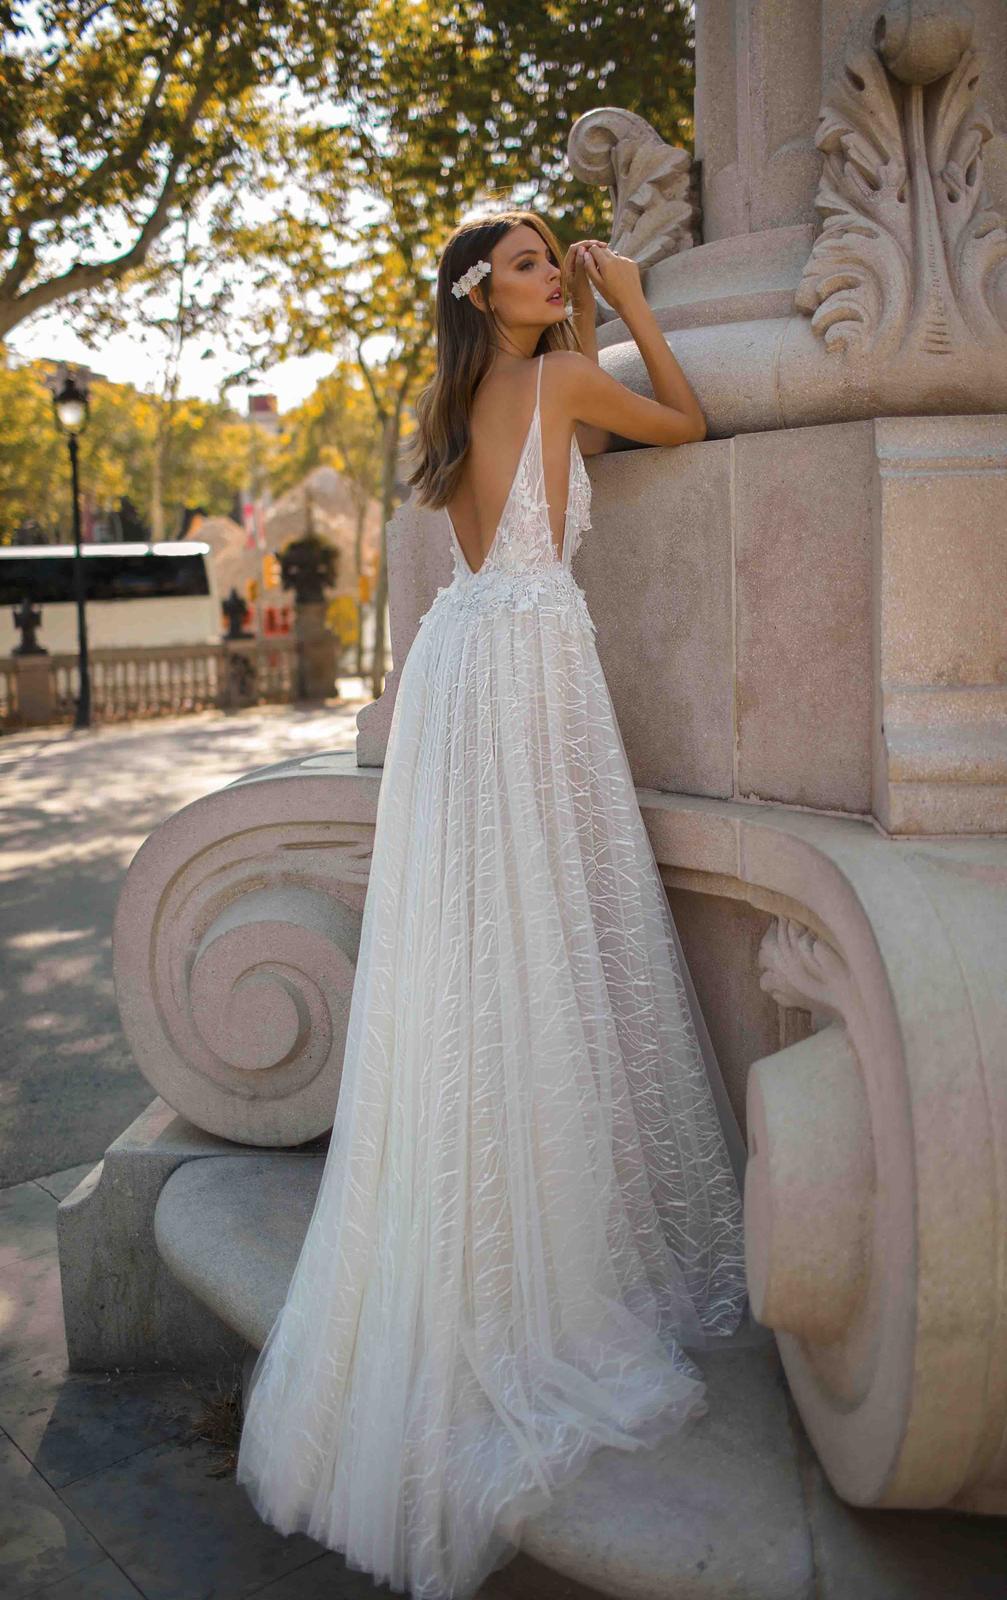 Muse by Berta * Svadobné šaty z kolekcií na rok 2019 - Obrázok č. 27